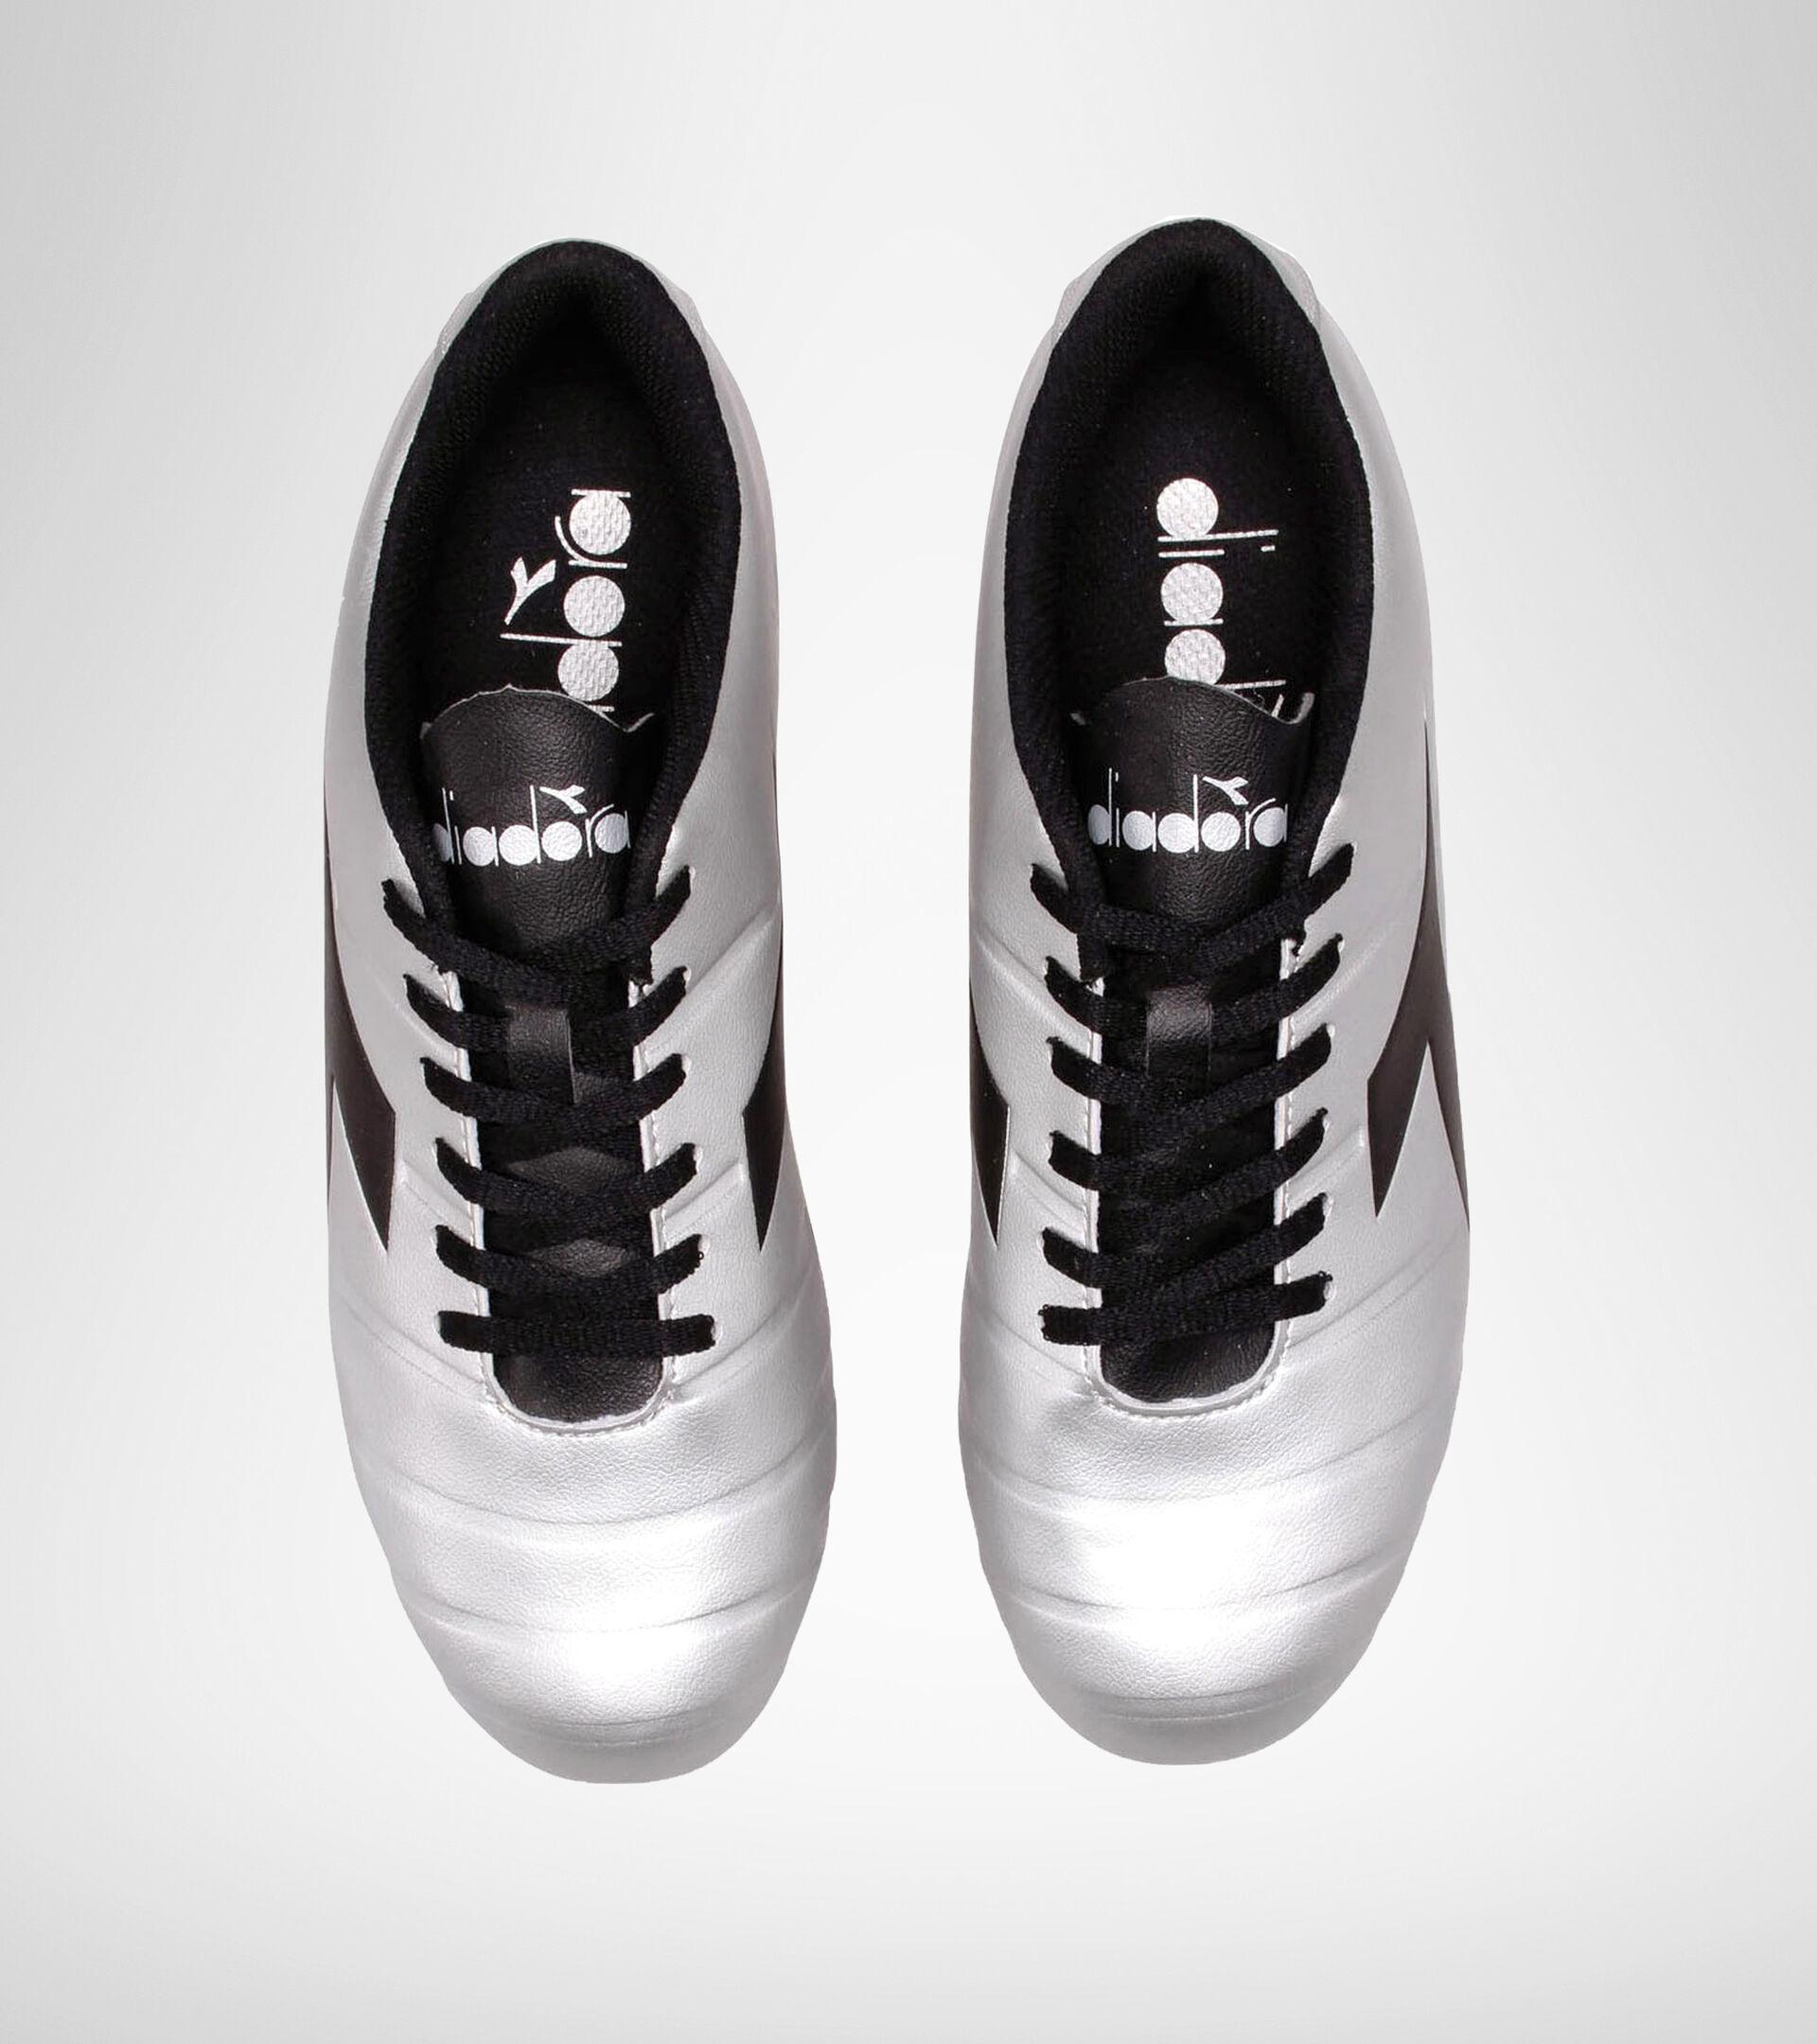 Firm ground football boot PICHICHI 3 MG14 SILVER DD/BLACK - Diadora